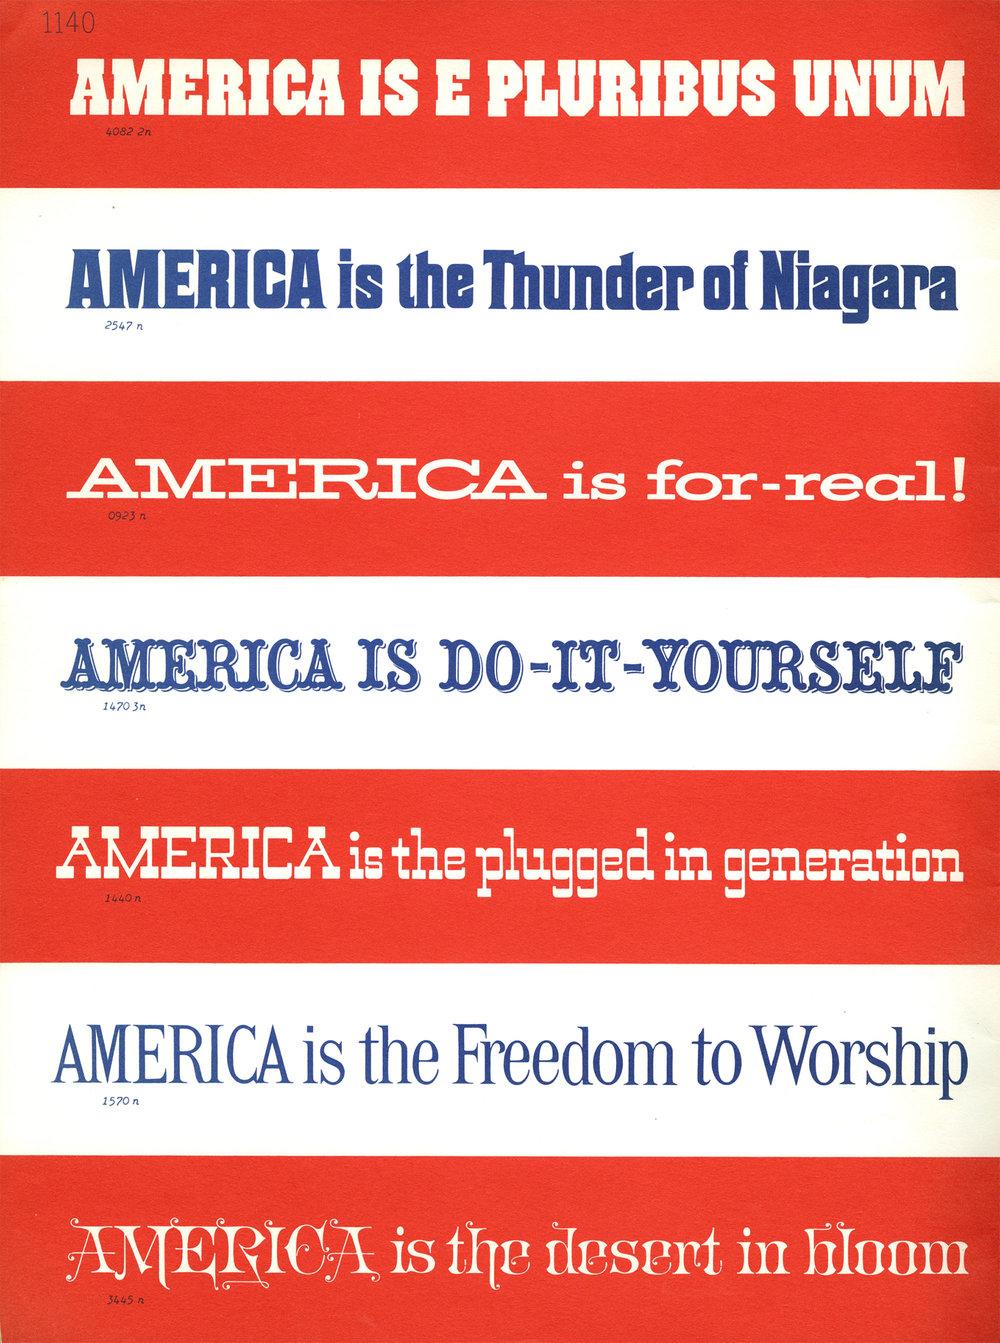 Americana-1.jpg